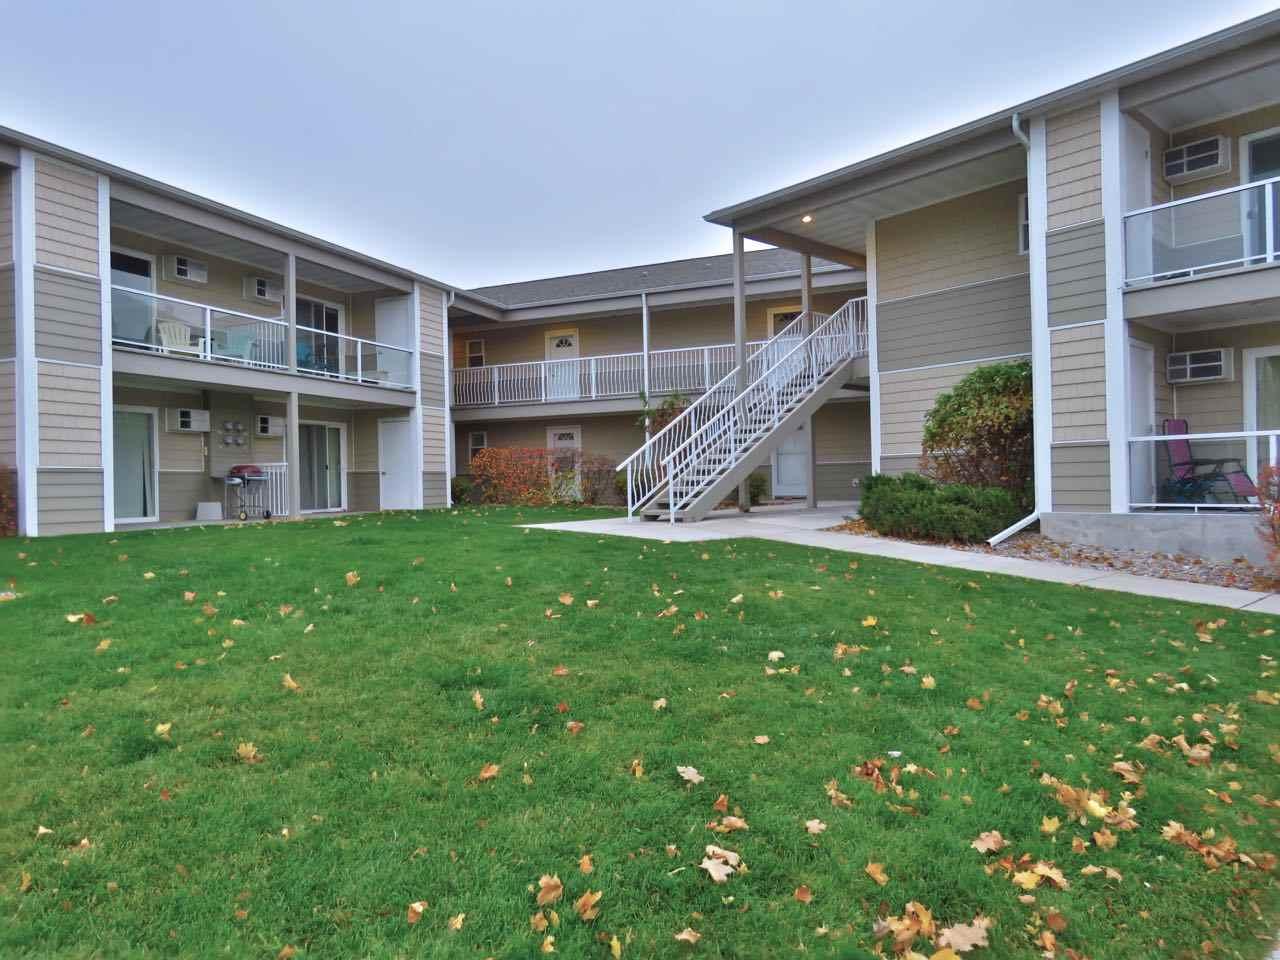 Real Estate for Sale, ListingId: 36217471, Polson,MT59860